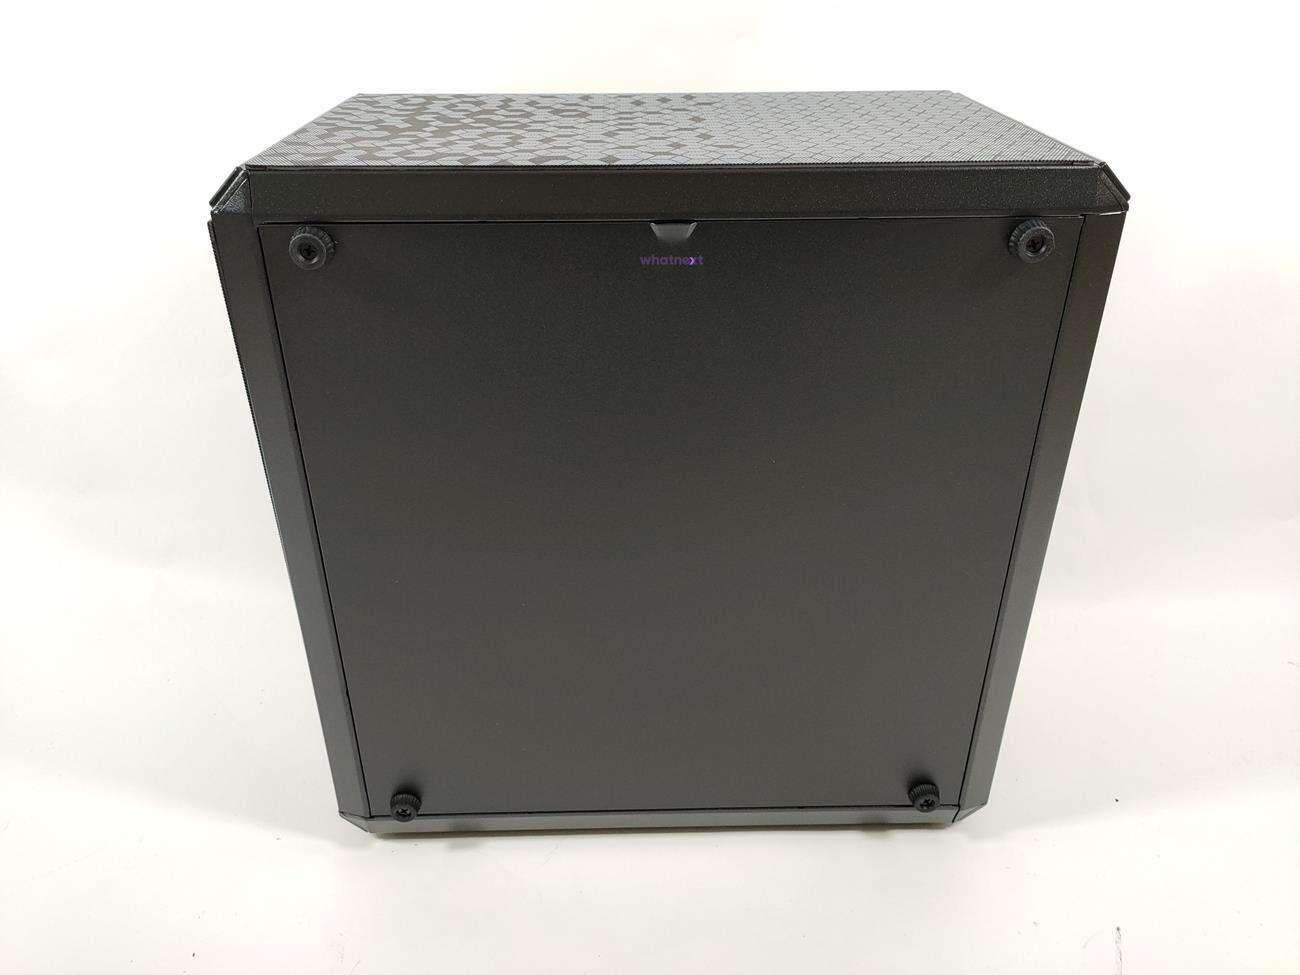 test Cooler Master Masterbox Q300L, recenzja Cooler Master Masterbox Q300L, review Cooler Master Masterbox Q300L, opinia Cooler Master Masterbox Q300L